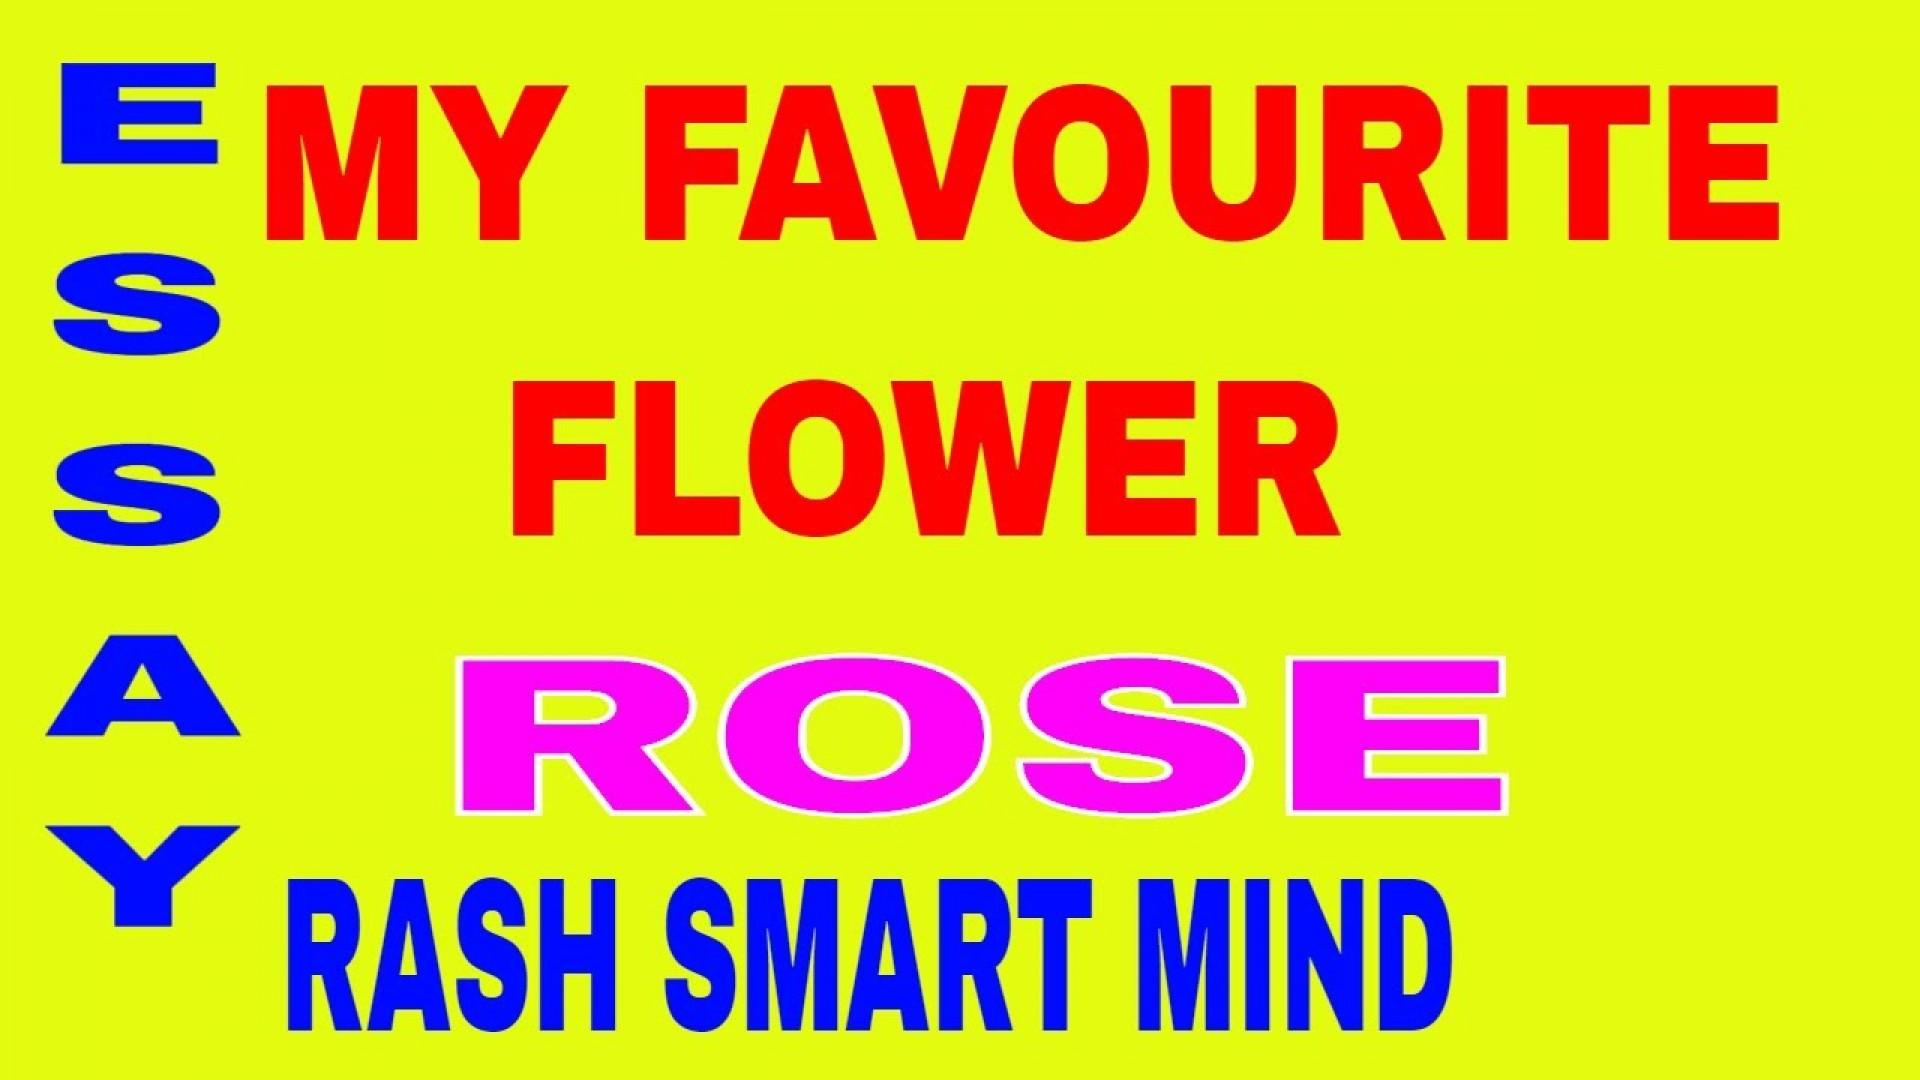 001 About Rose Flower Essay Example Unbelievable In Marathi Kannada Language 1920